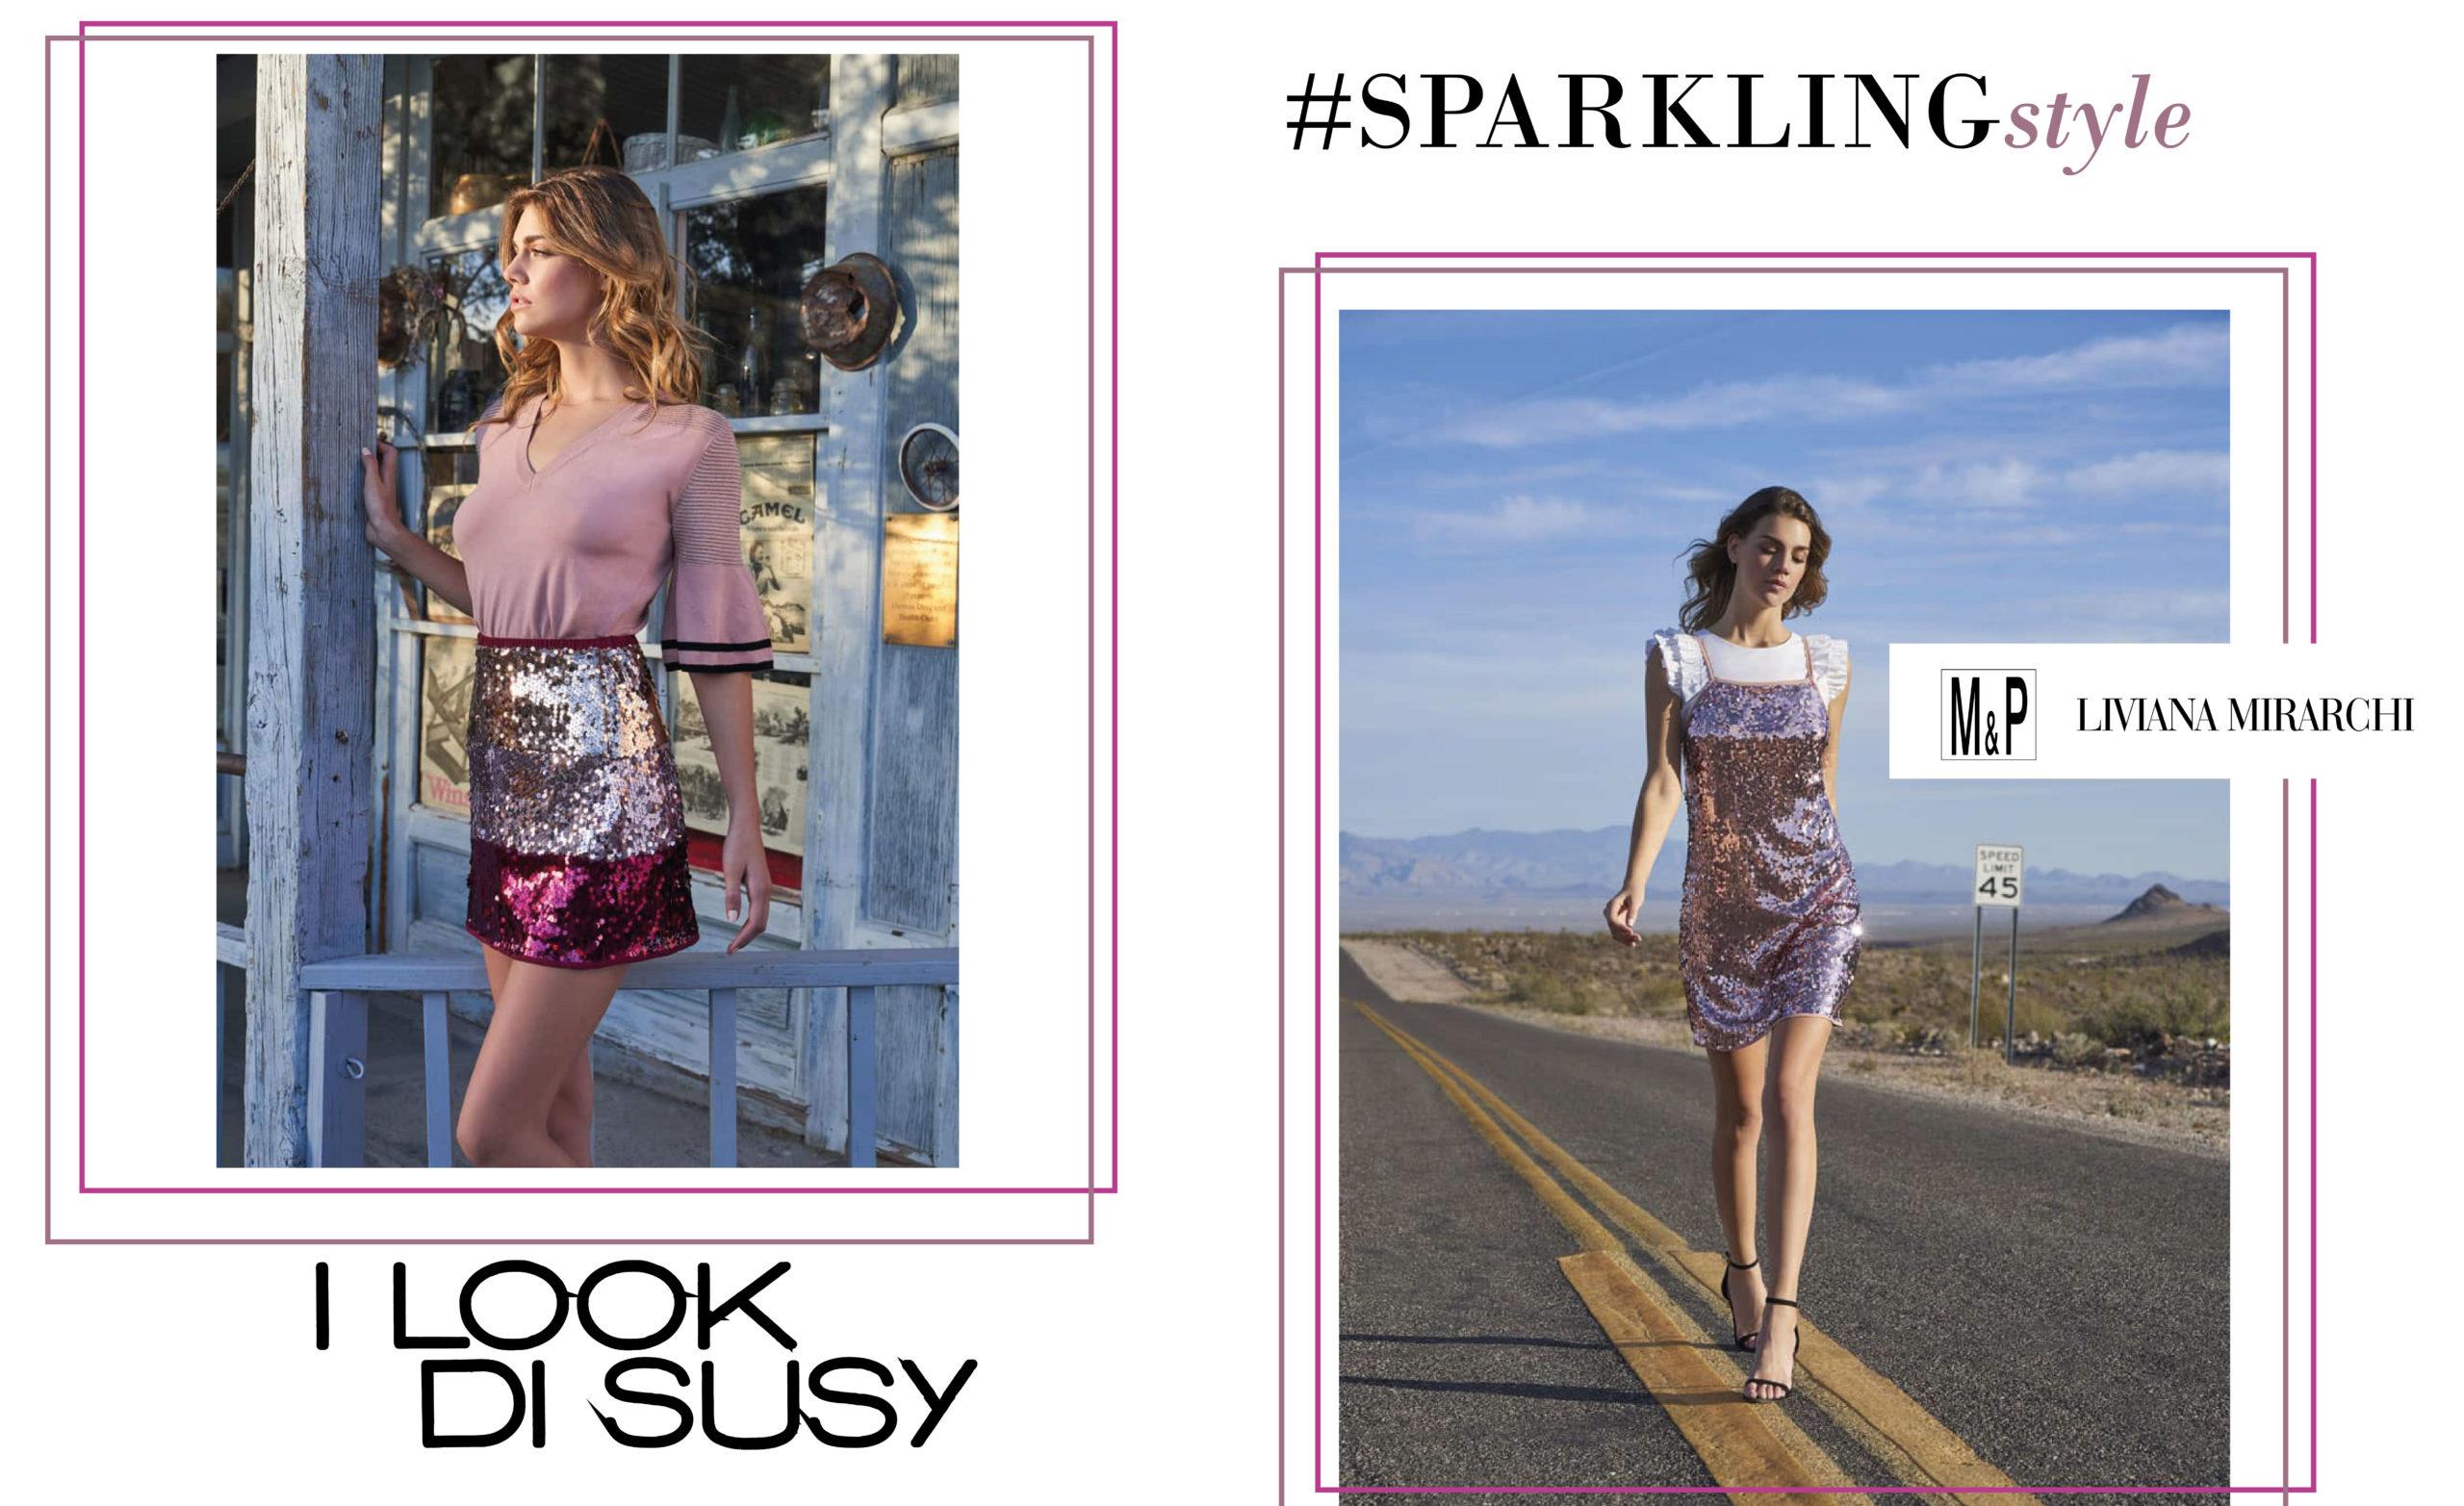 I Look di Susy: sparkling style